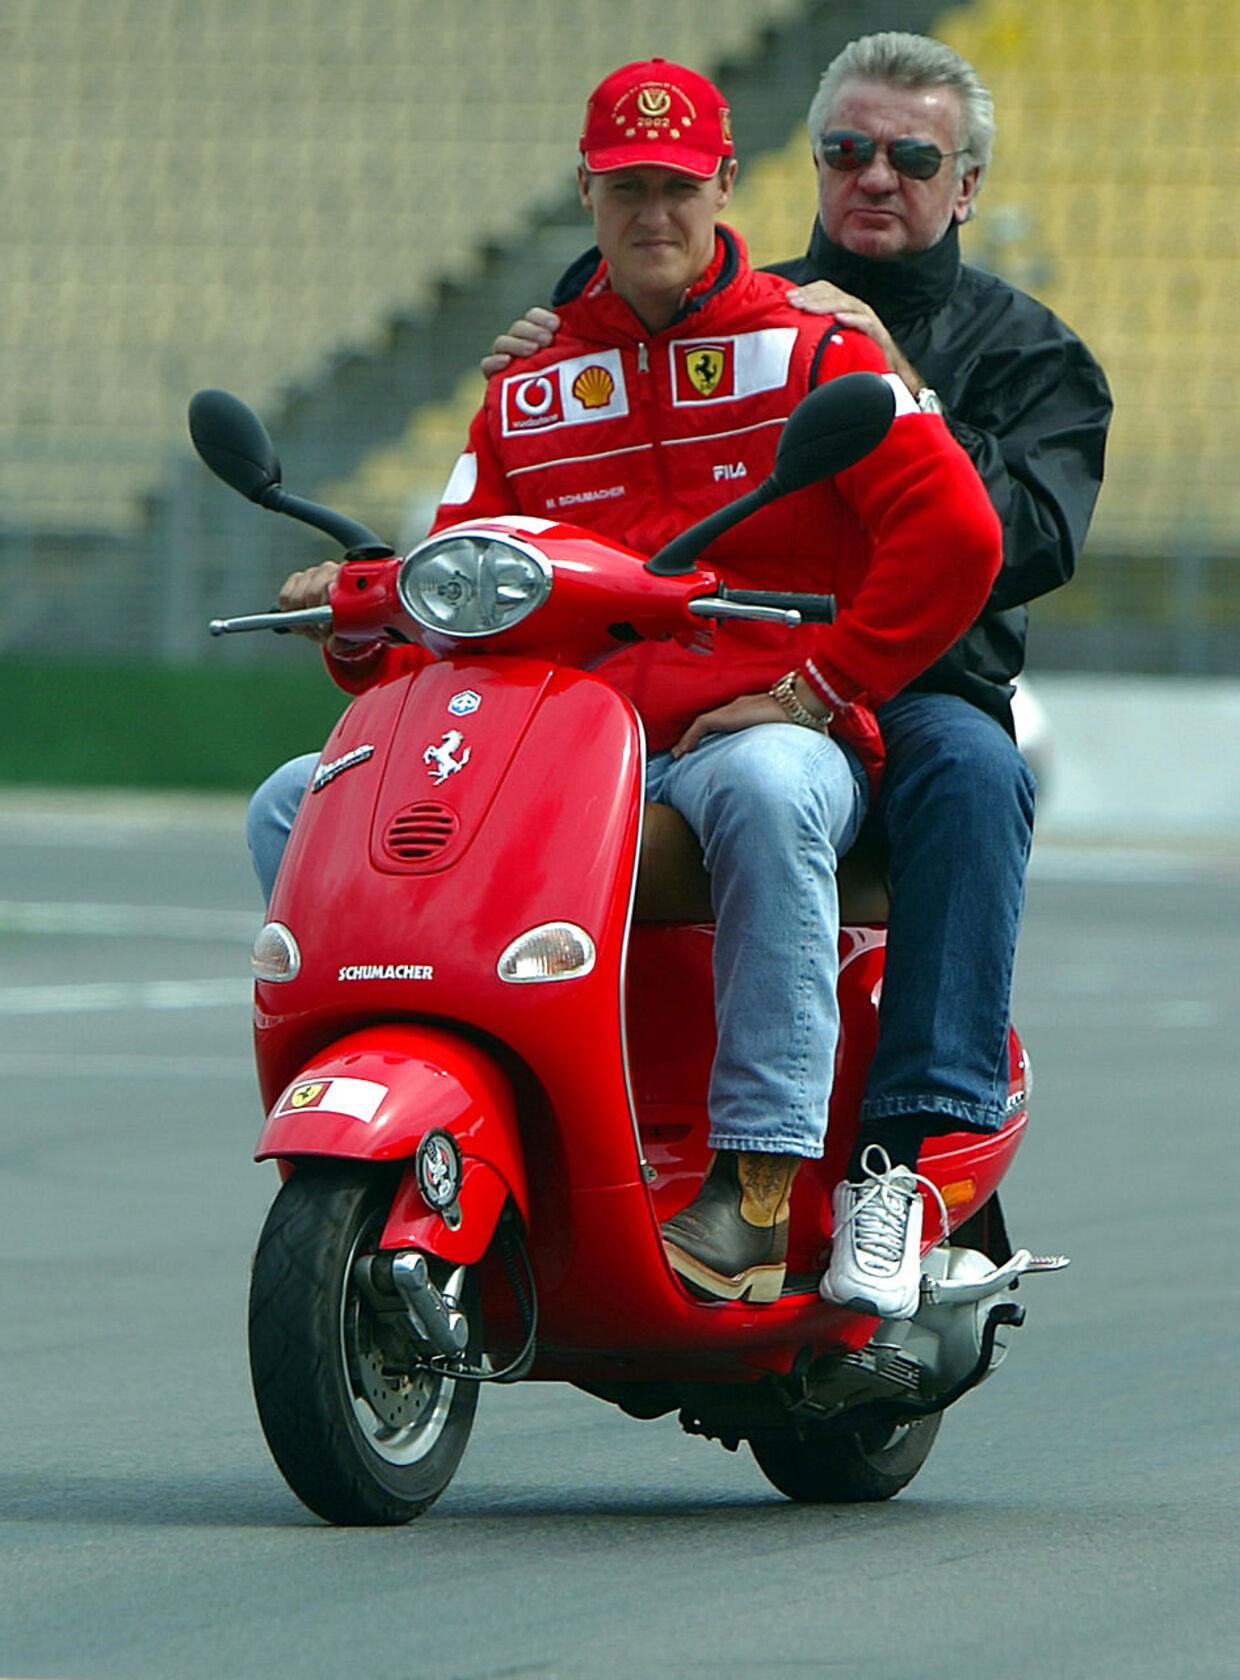 Michael Schumacher giver Willi Weber et lift på Hockenheim-banen i 2002.